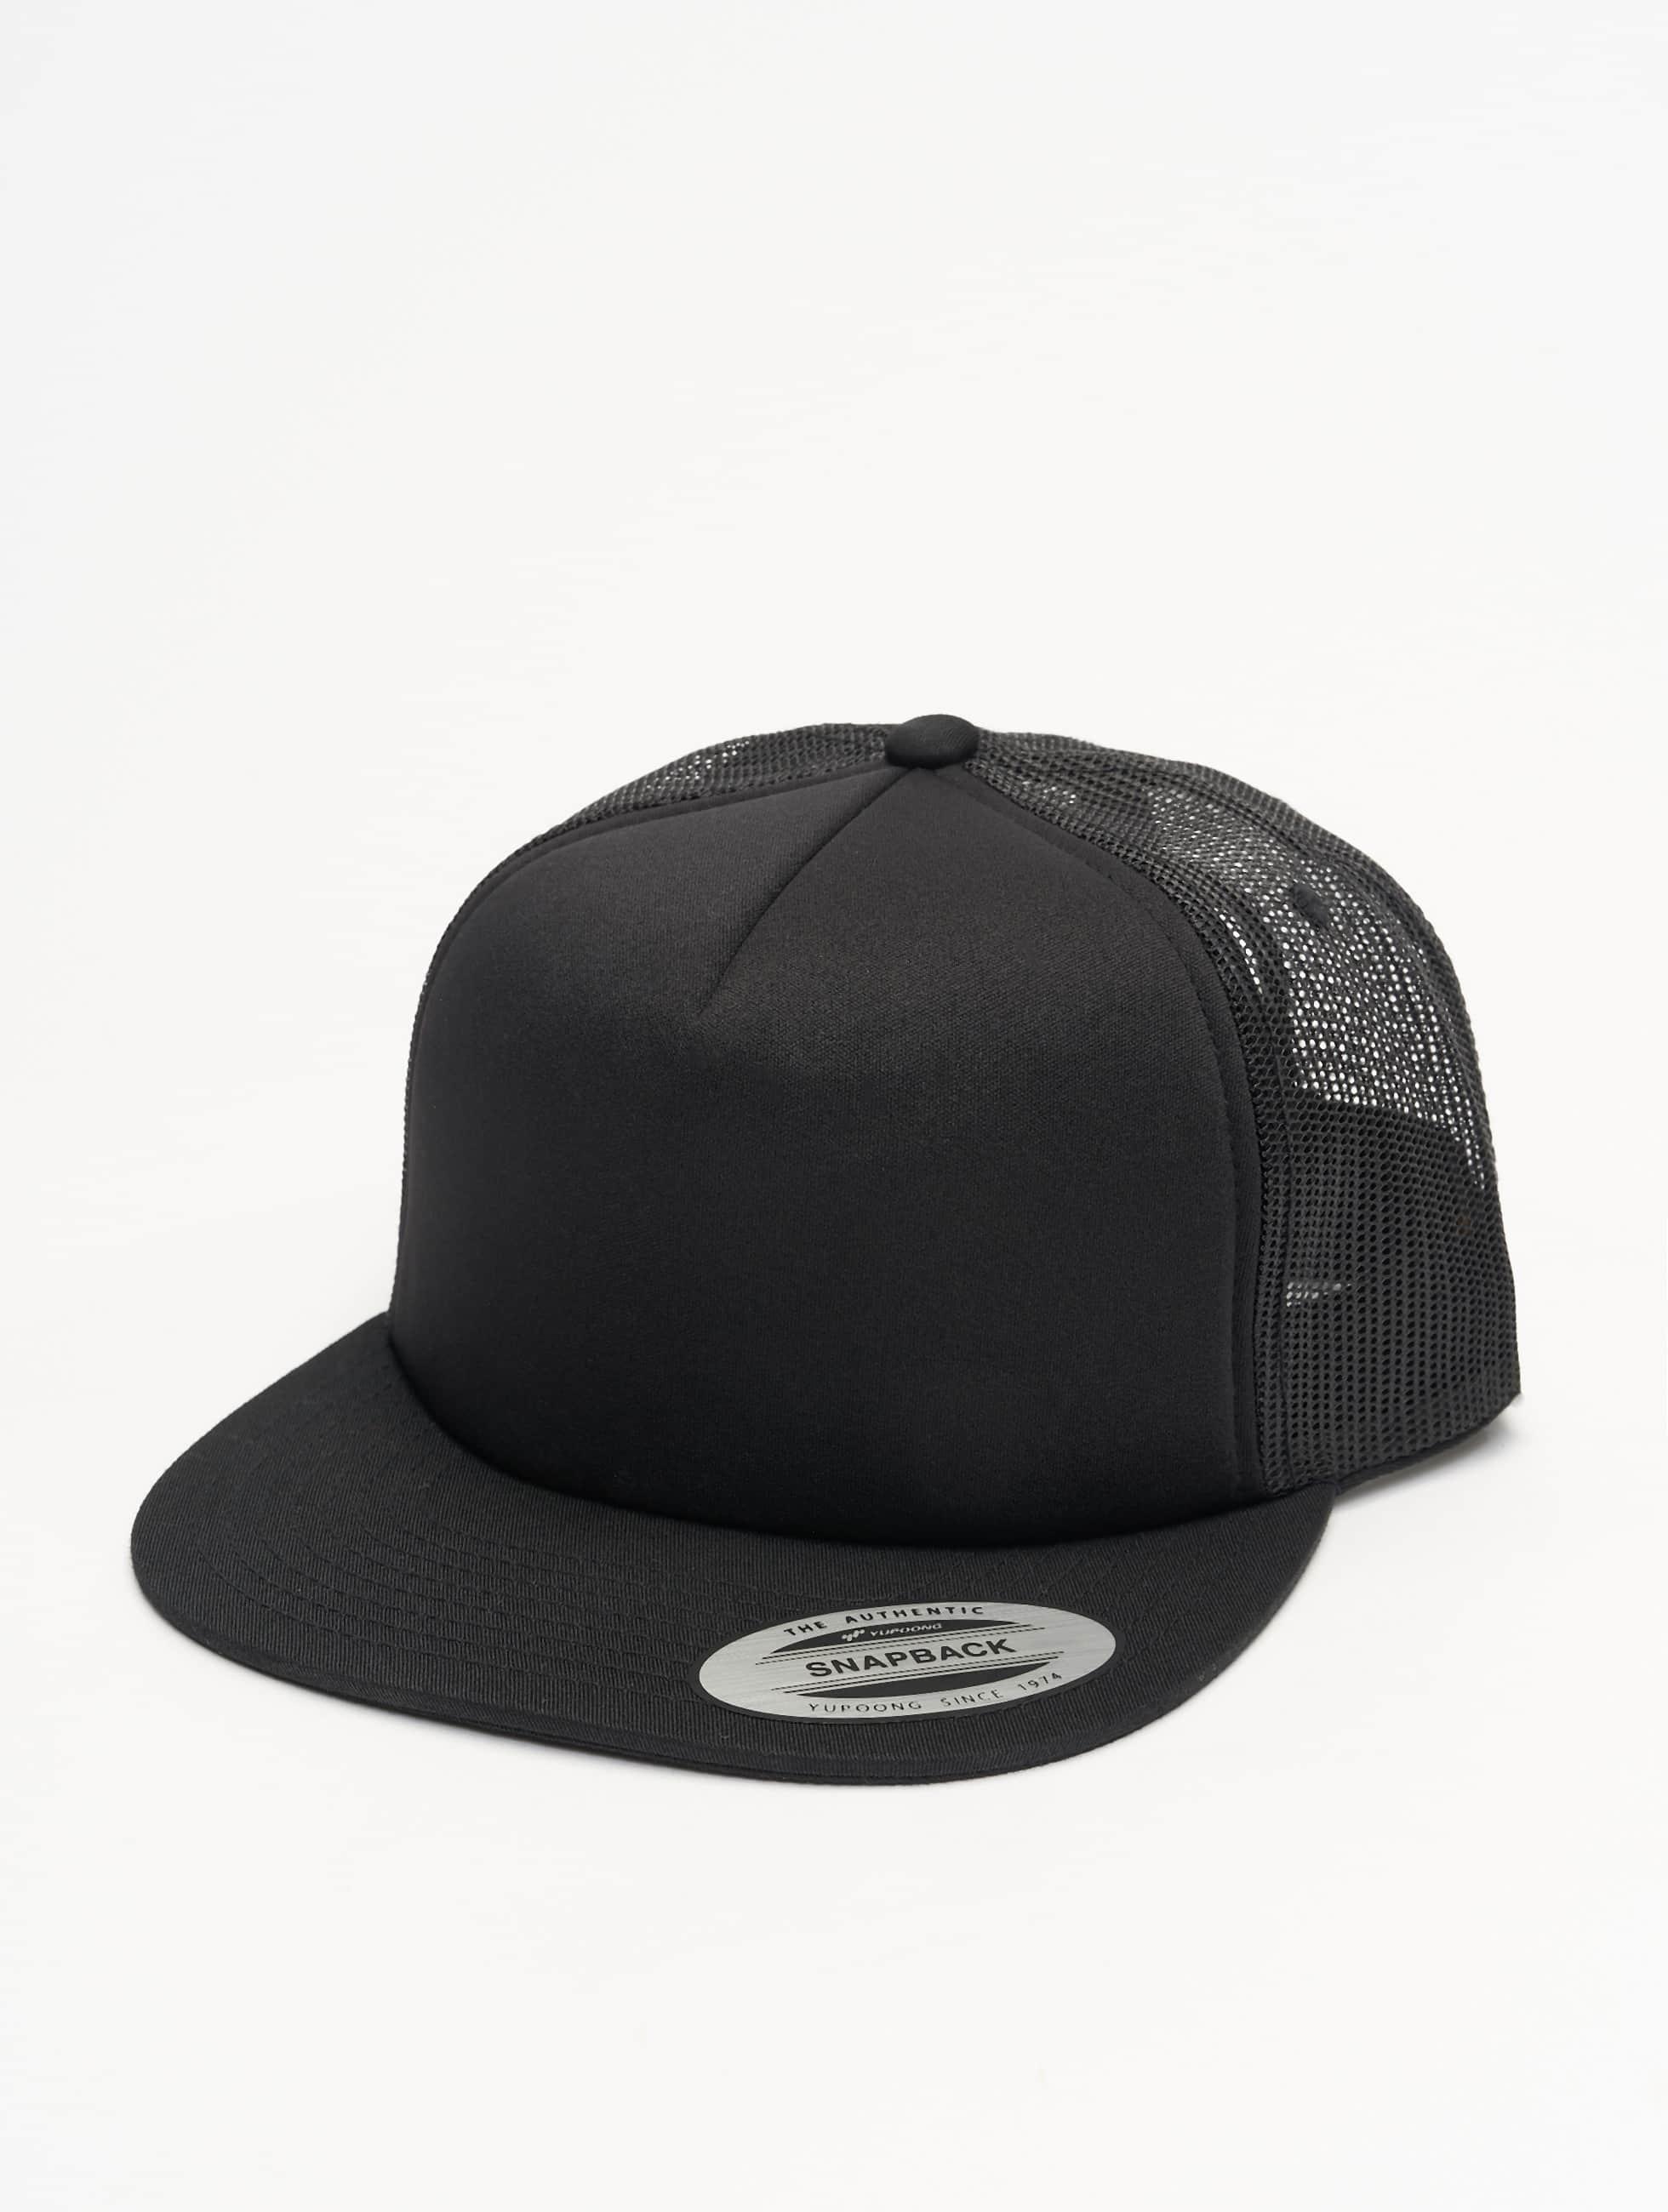 Flexfit Foam Trucker Cap Black